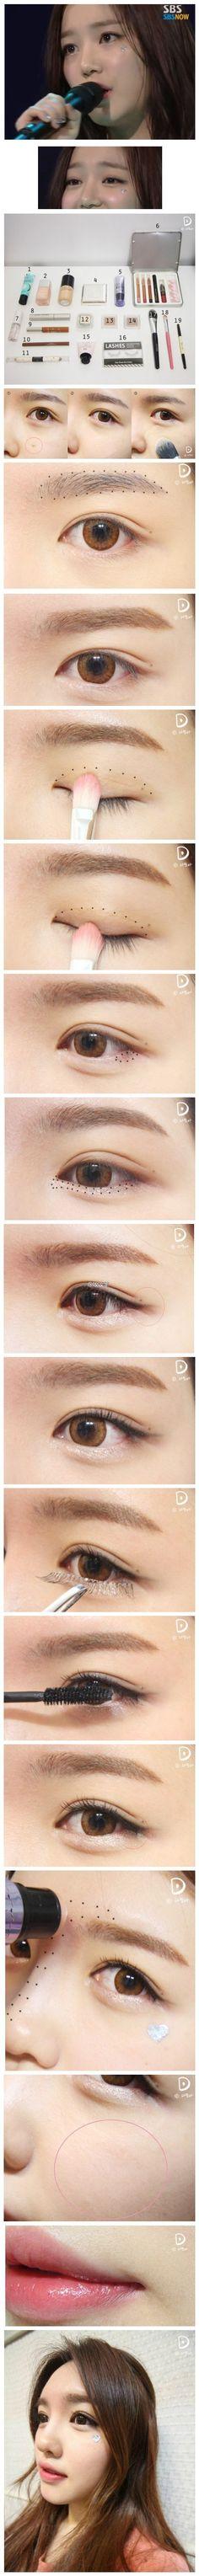 Korean make up ⭐️⭐️ |   #JoinNerium #DebbieKrug #NeriumKorea www.AsianSkincare.Rocks